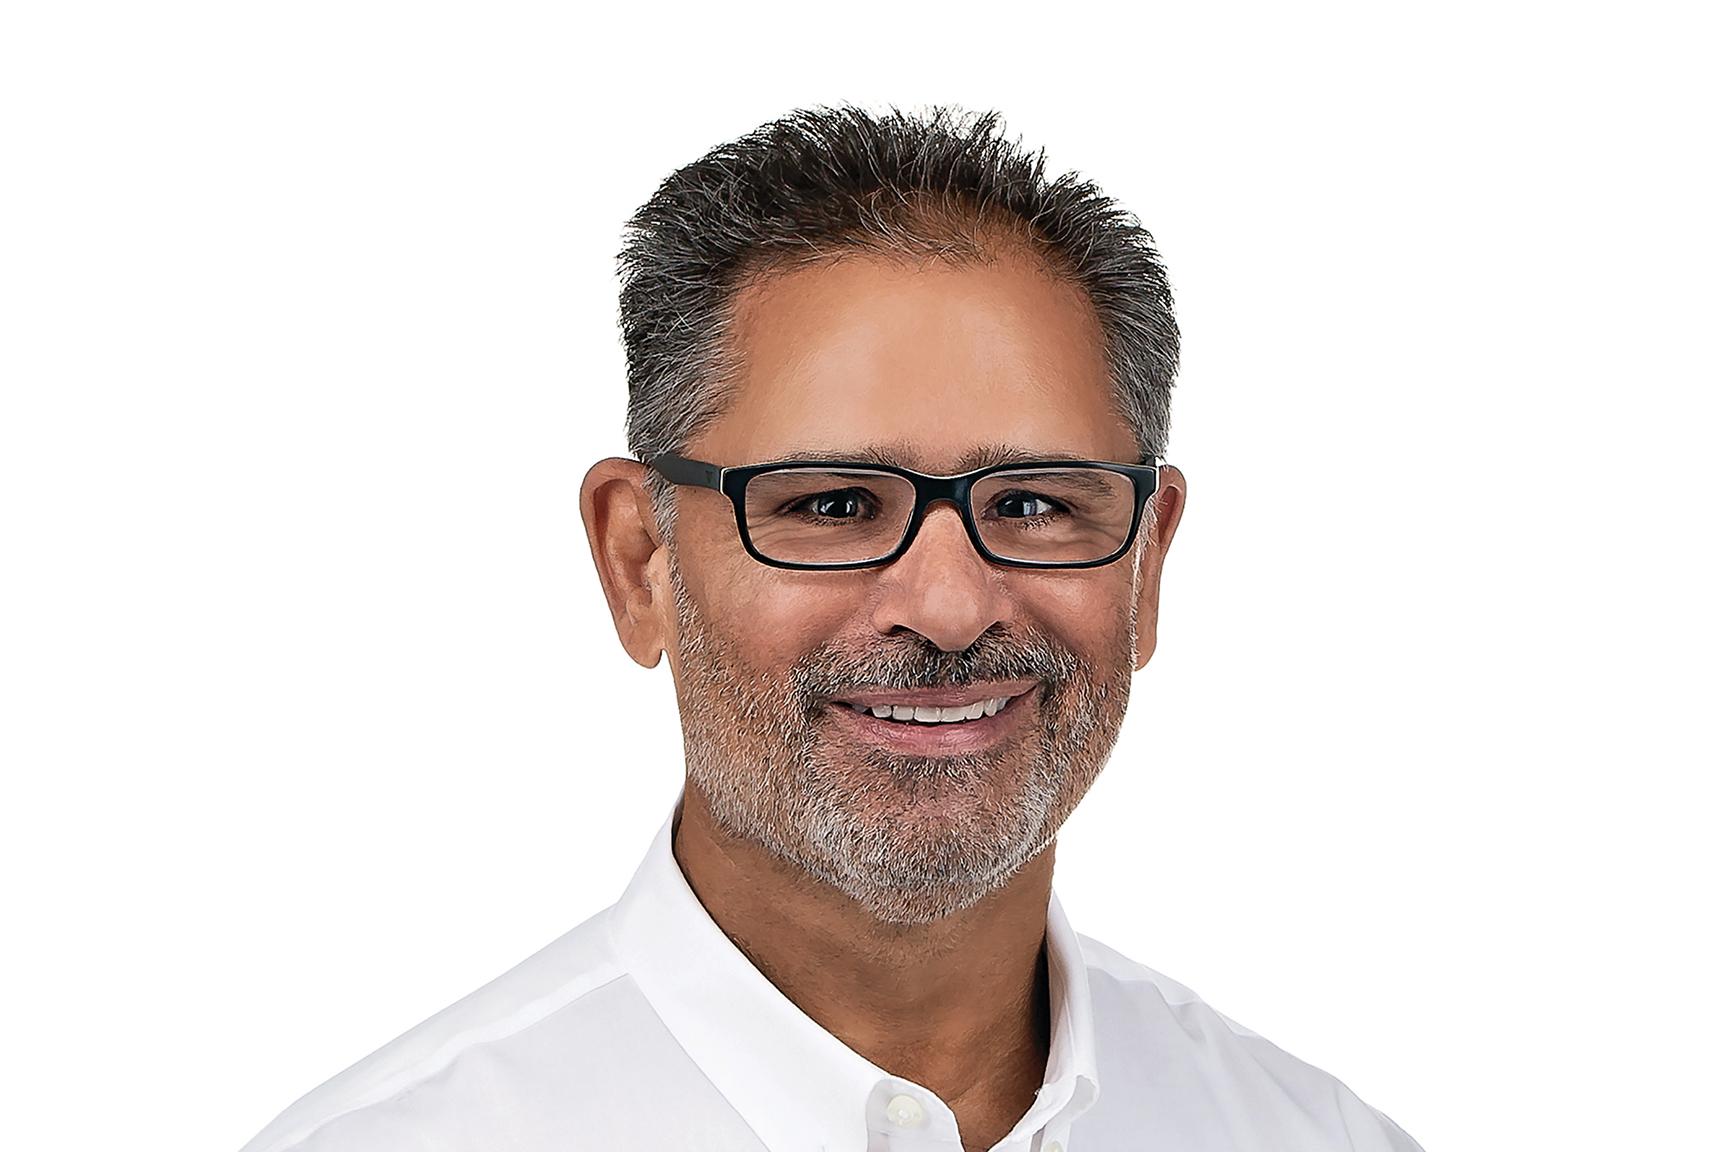 Vincent D Mattera, Jr, CEO of II-VI Incorporated